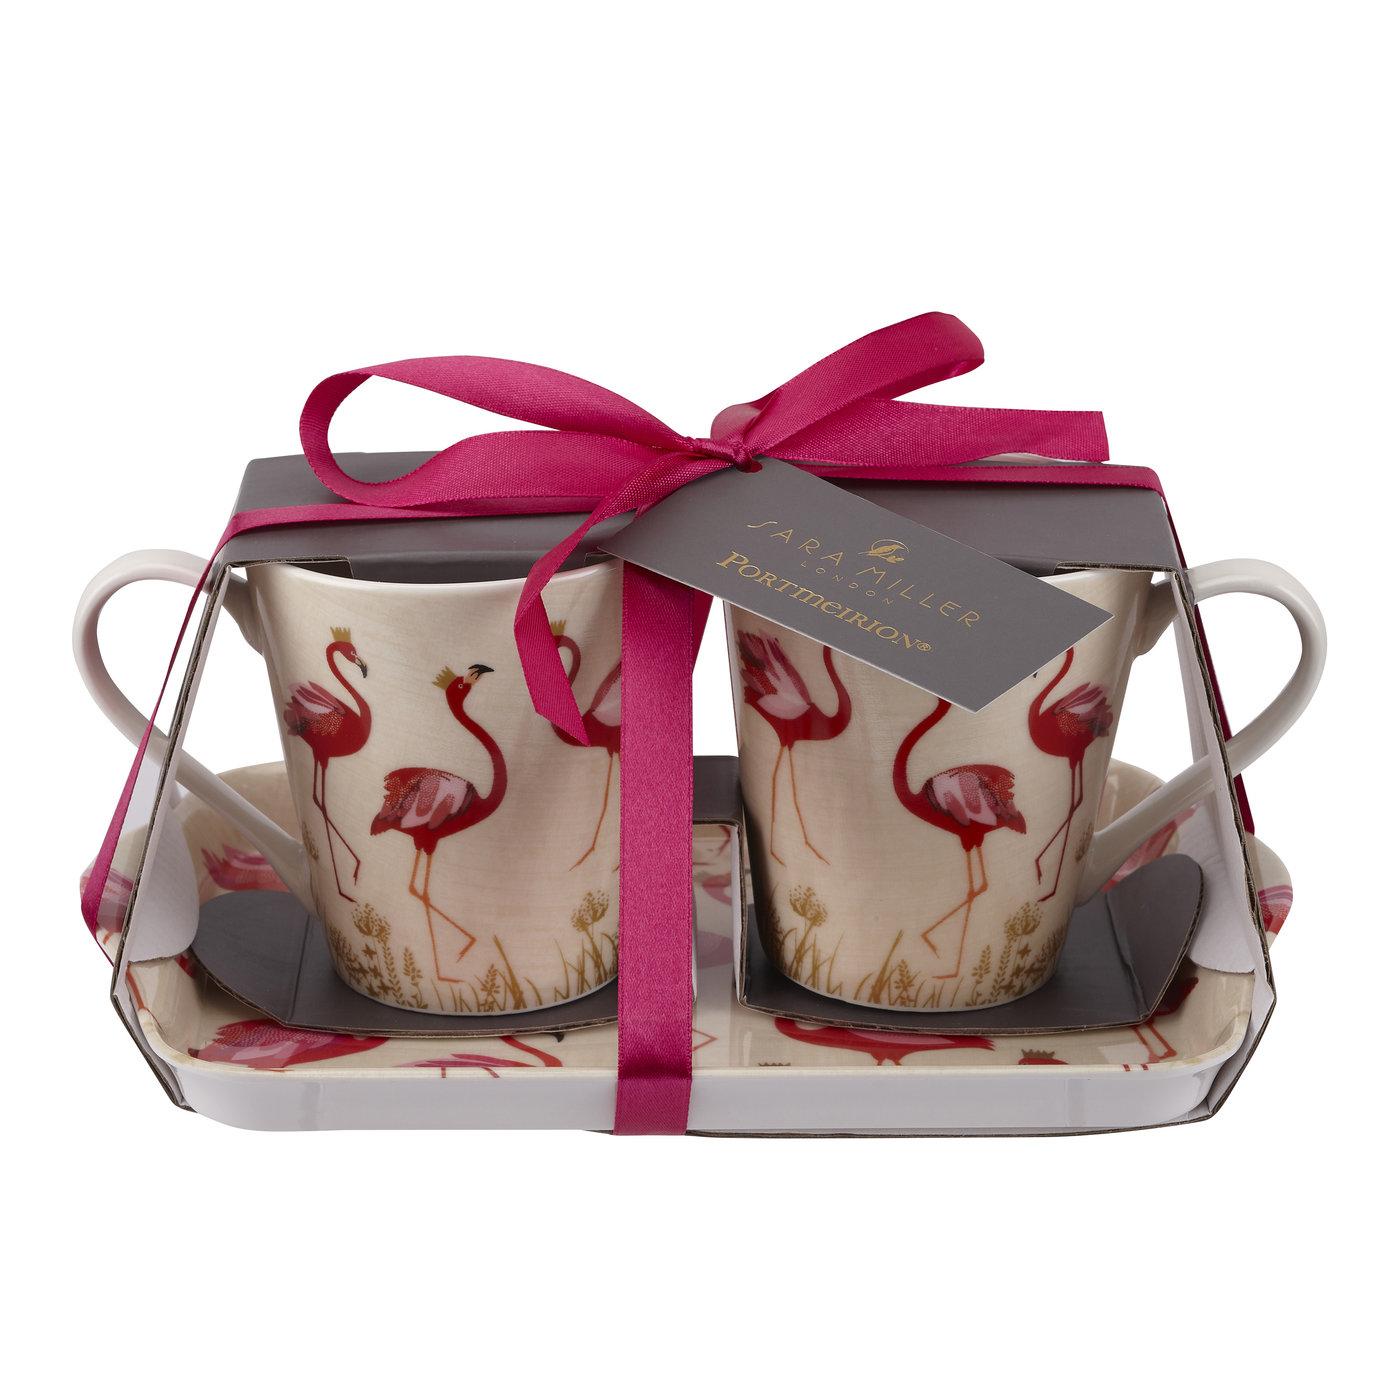 Sara Miller London Portmeirion The Flamingo Mug and Tray Set